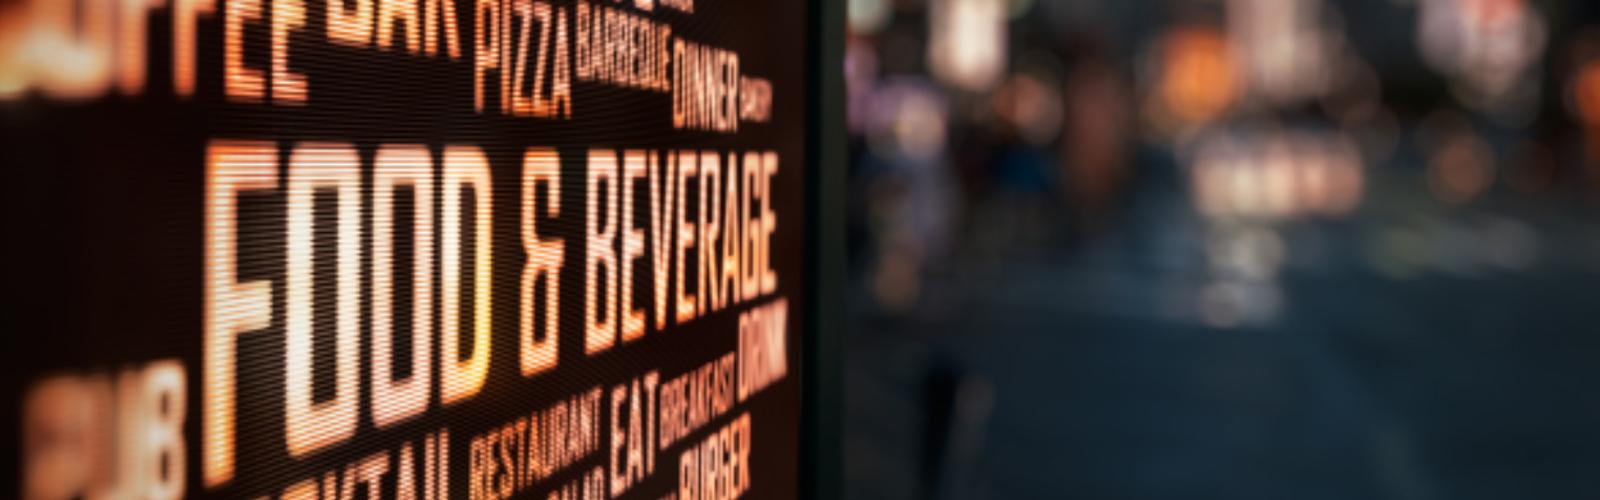 Why is Digital Signage Gaining Popularity